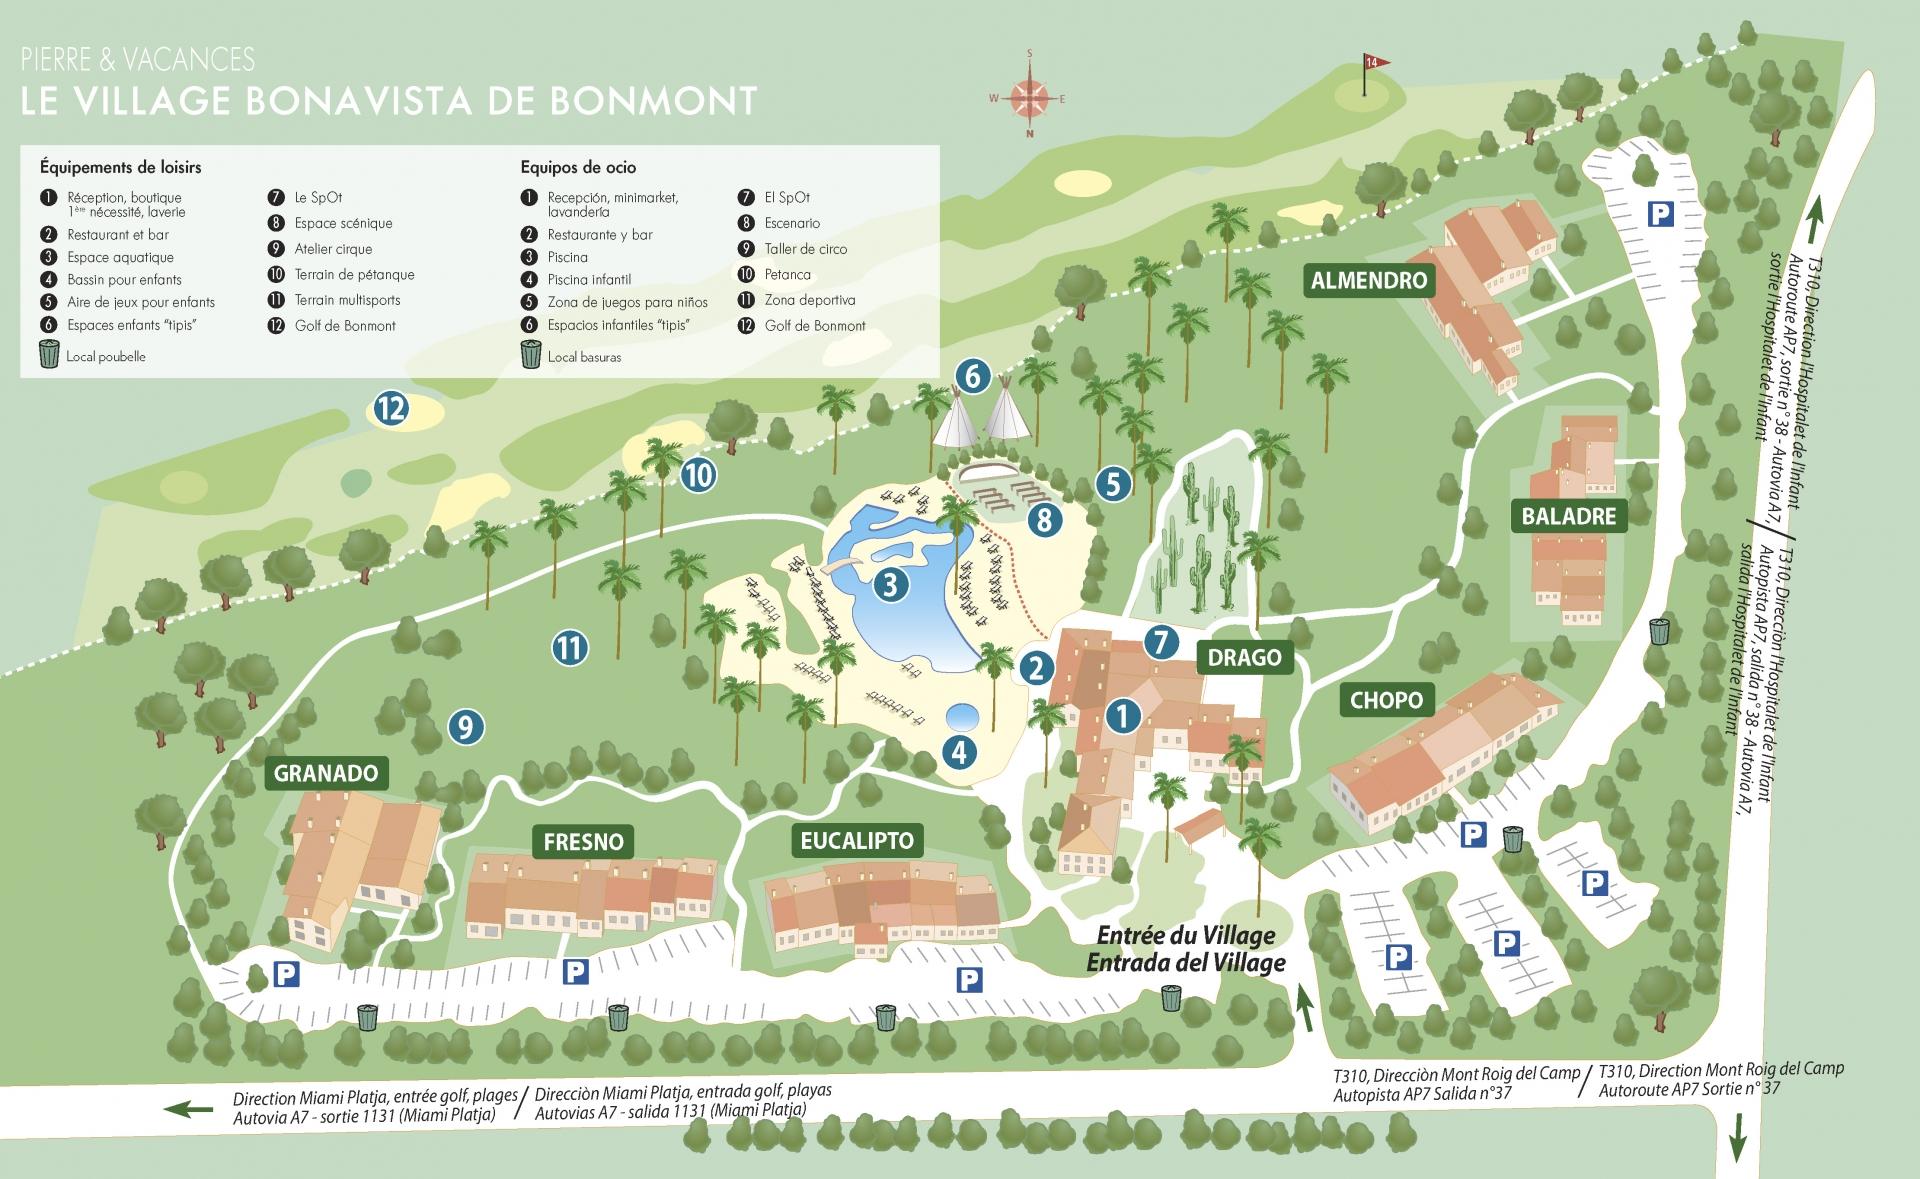 Pierre & Vacances Village Bonavista de Bonmont